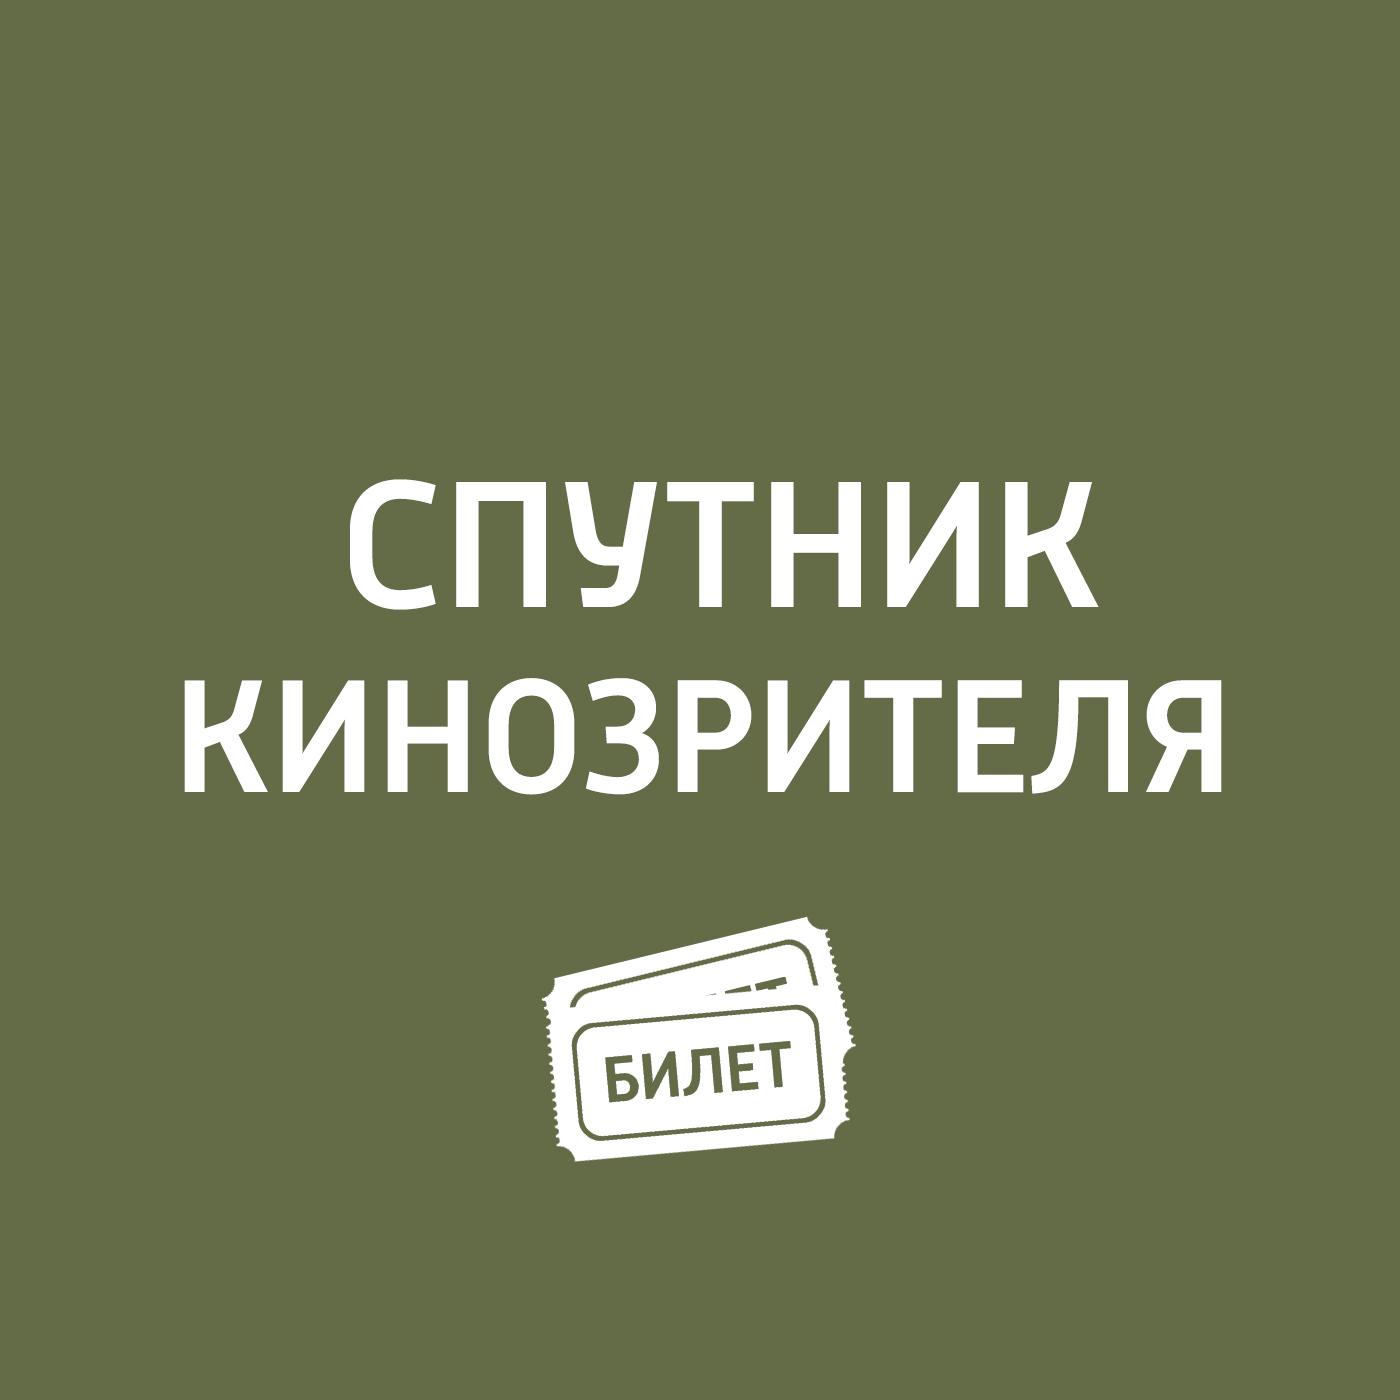 Антон Долин Антон посмотрел фильм «Рай антон долин сансет бульвар